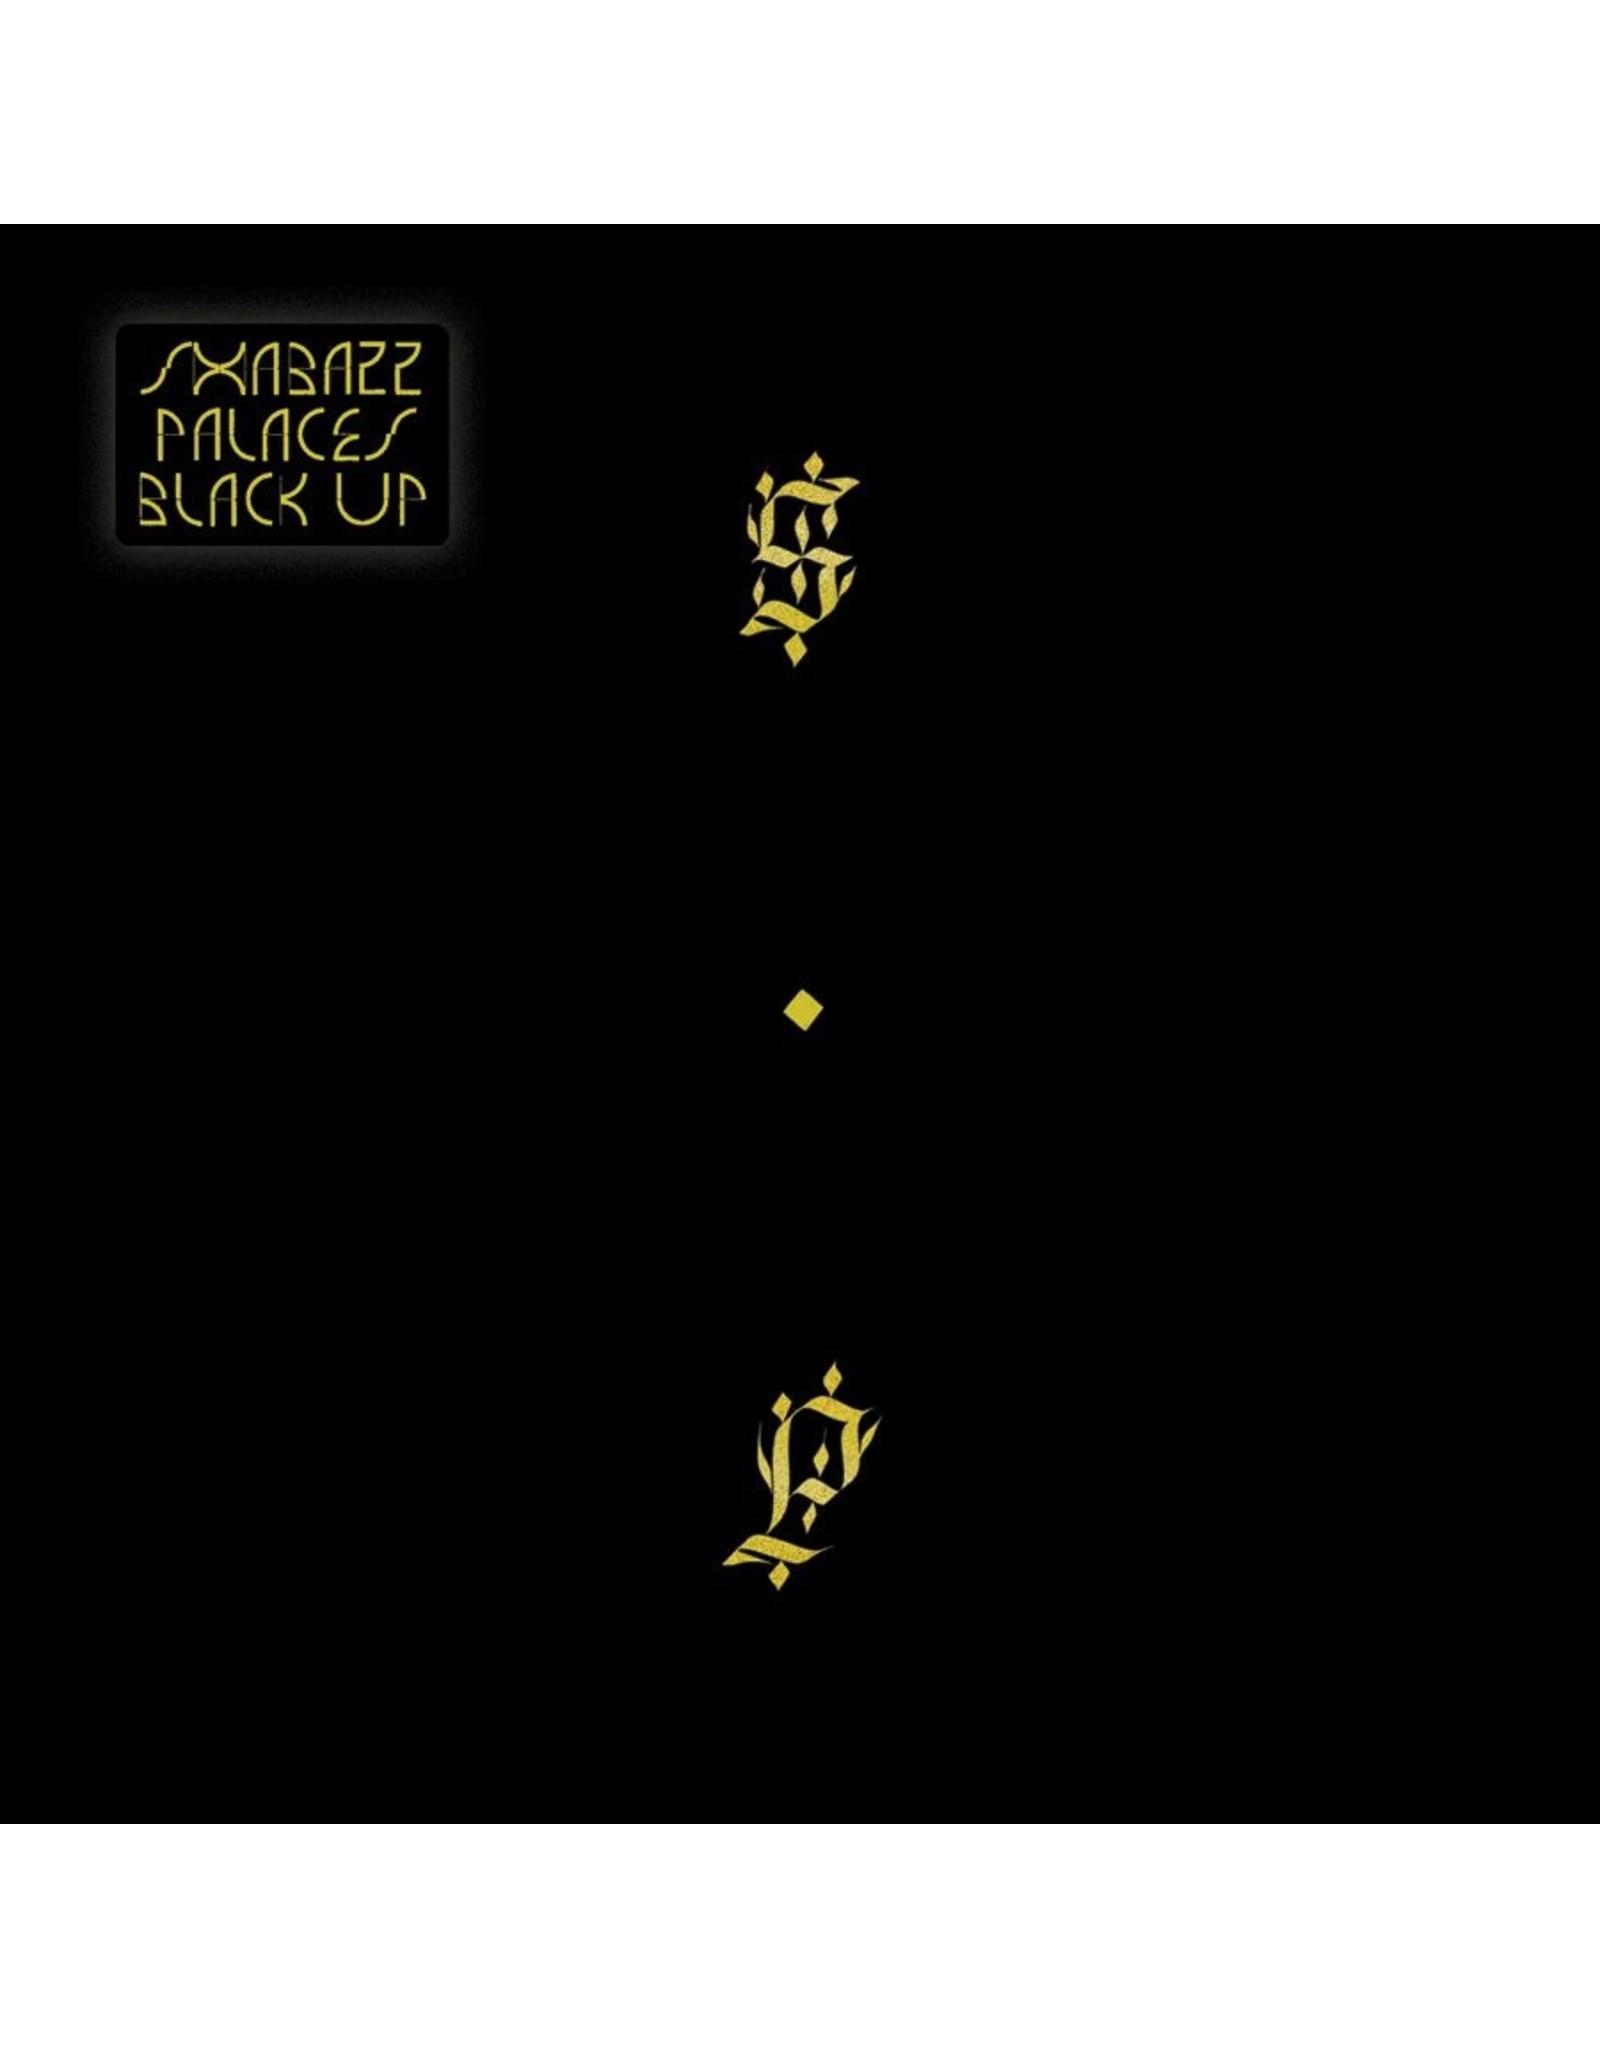 New Vinyl Shabazz Palaces - Black Up LP